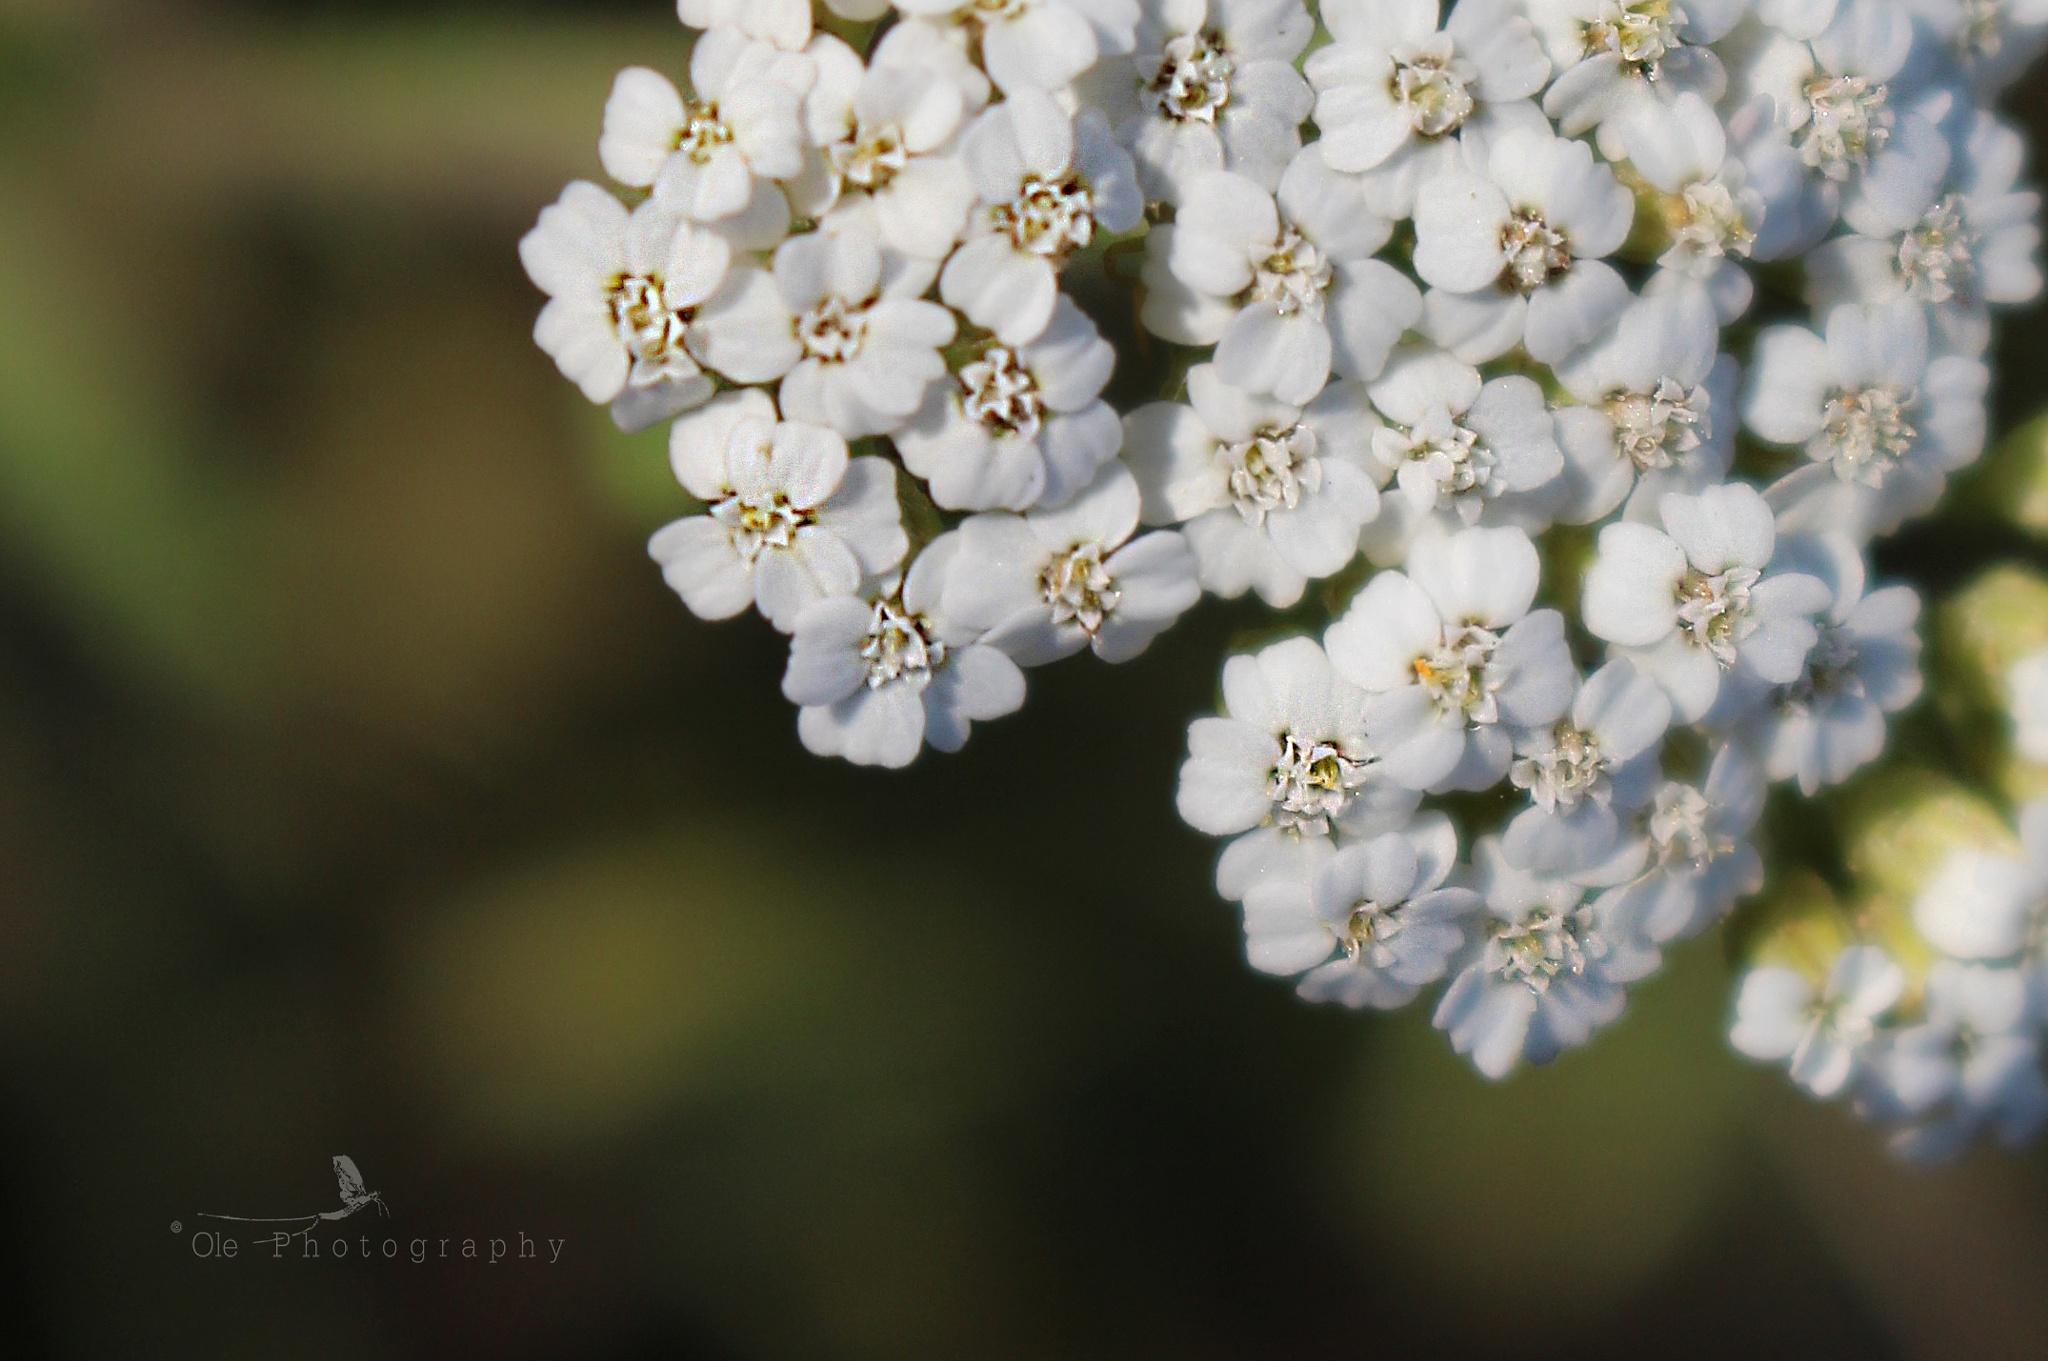 Yarrow - Achillea millefolium by OlePhotography